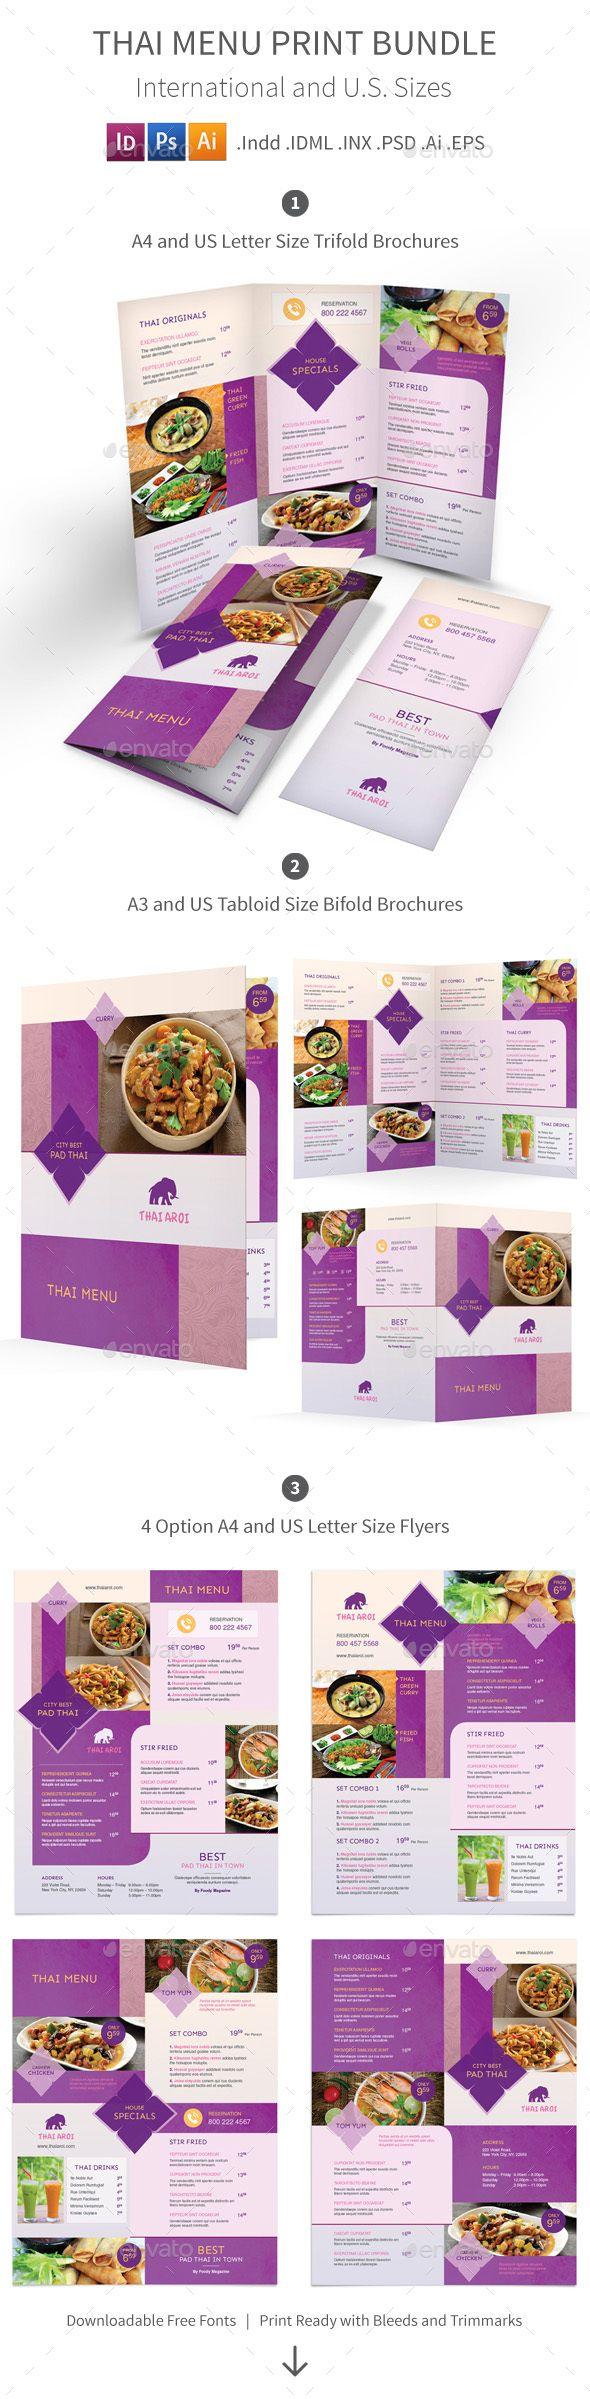 64 best Menu & thai foods images on Pinterest | Asian desserts ...